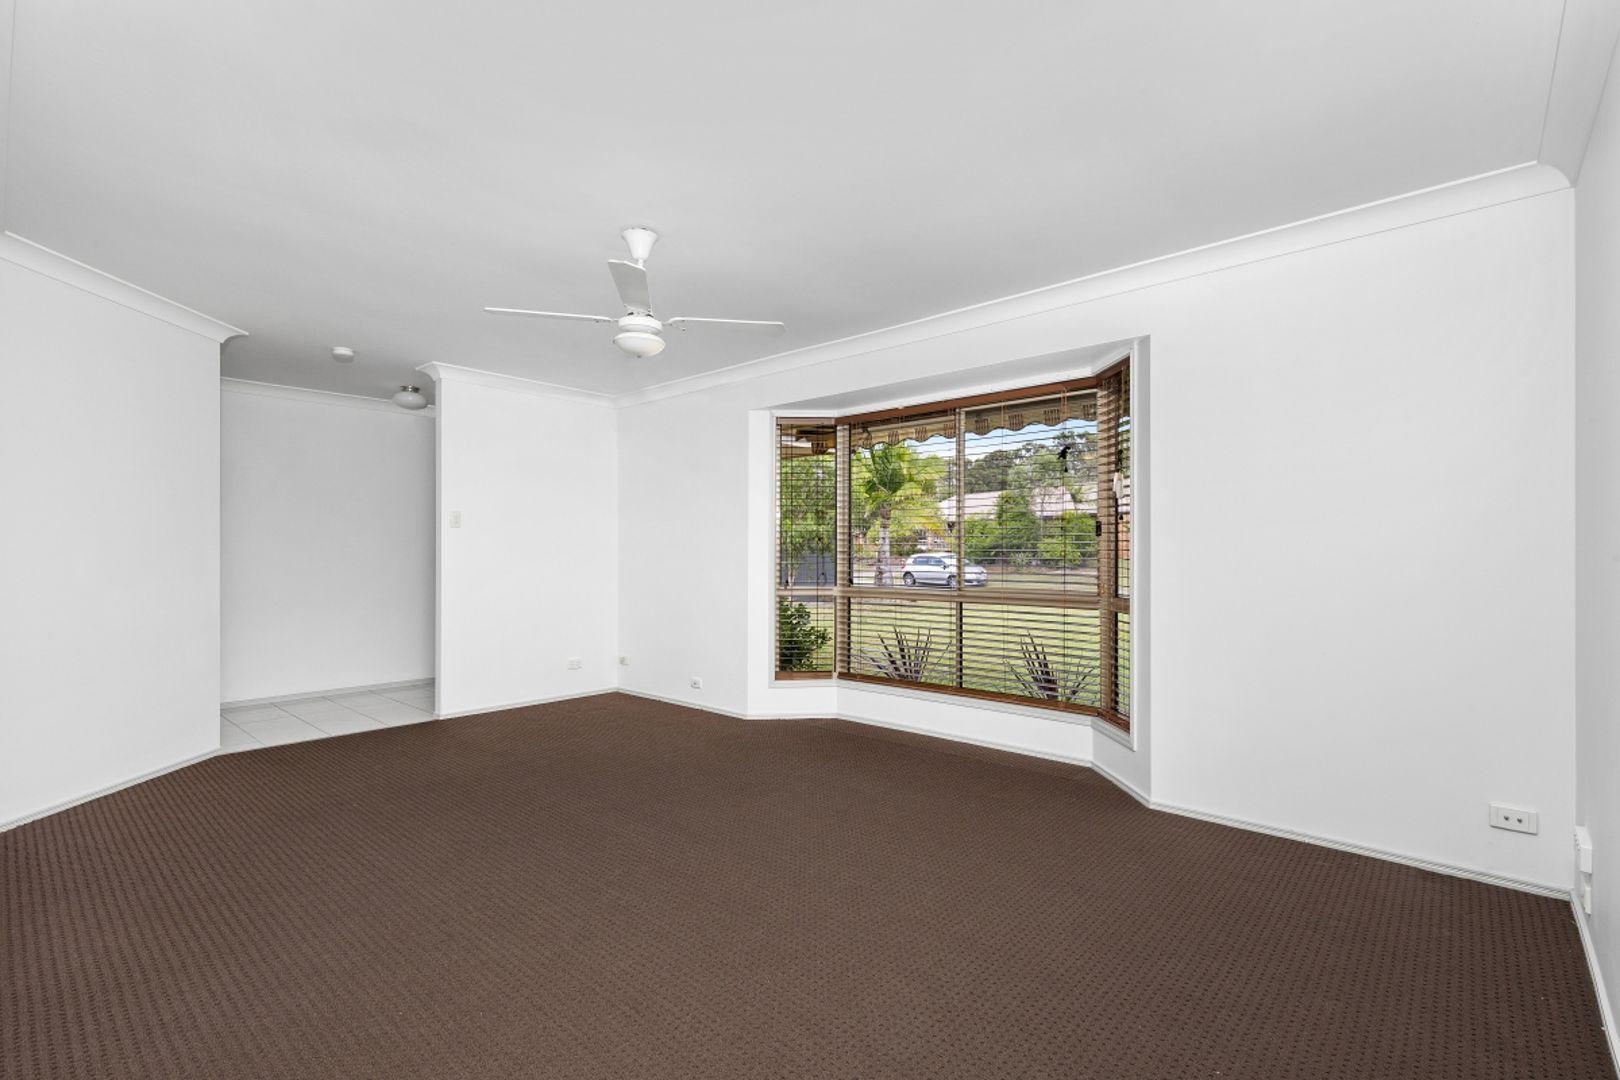 26 Kingaroy Avenue, Helensvale QLD 4212, Image 2